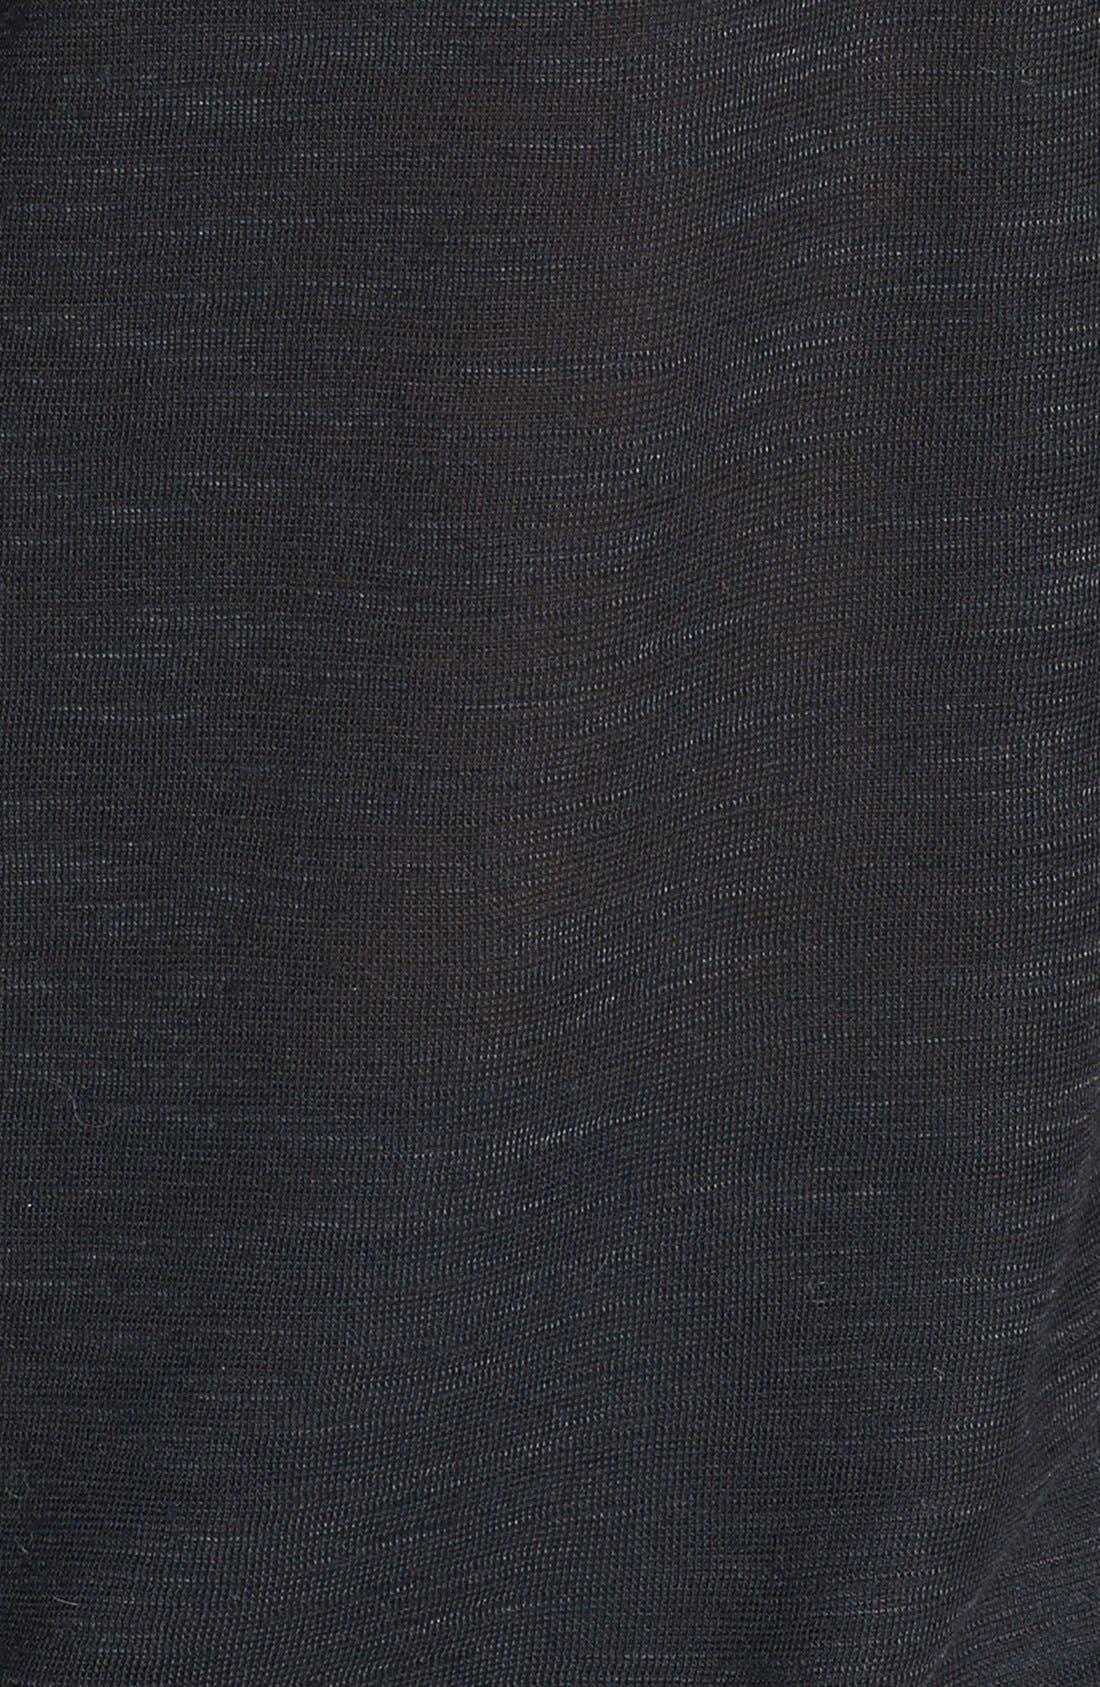 Draped Shoulder Jersey Top,                             Alternate thumbnail 4, color,                             001